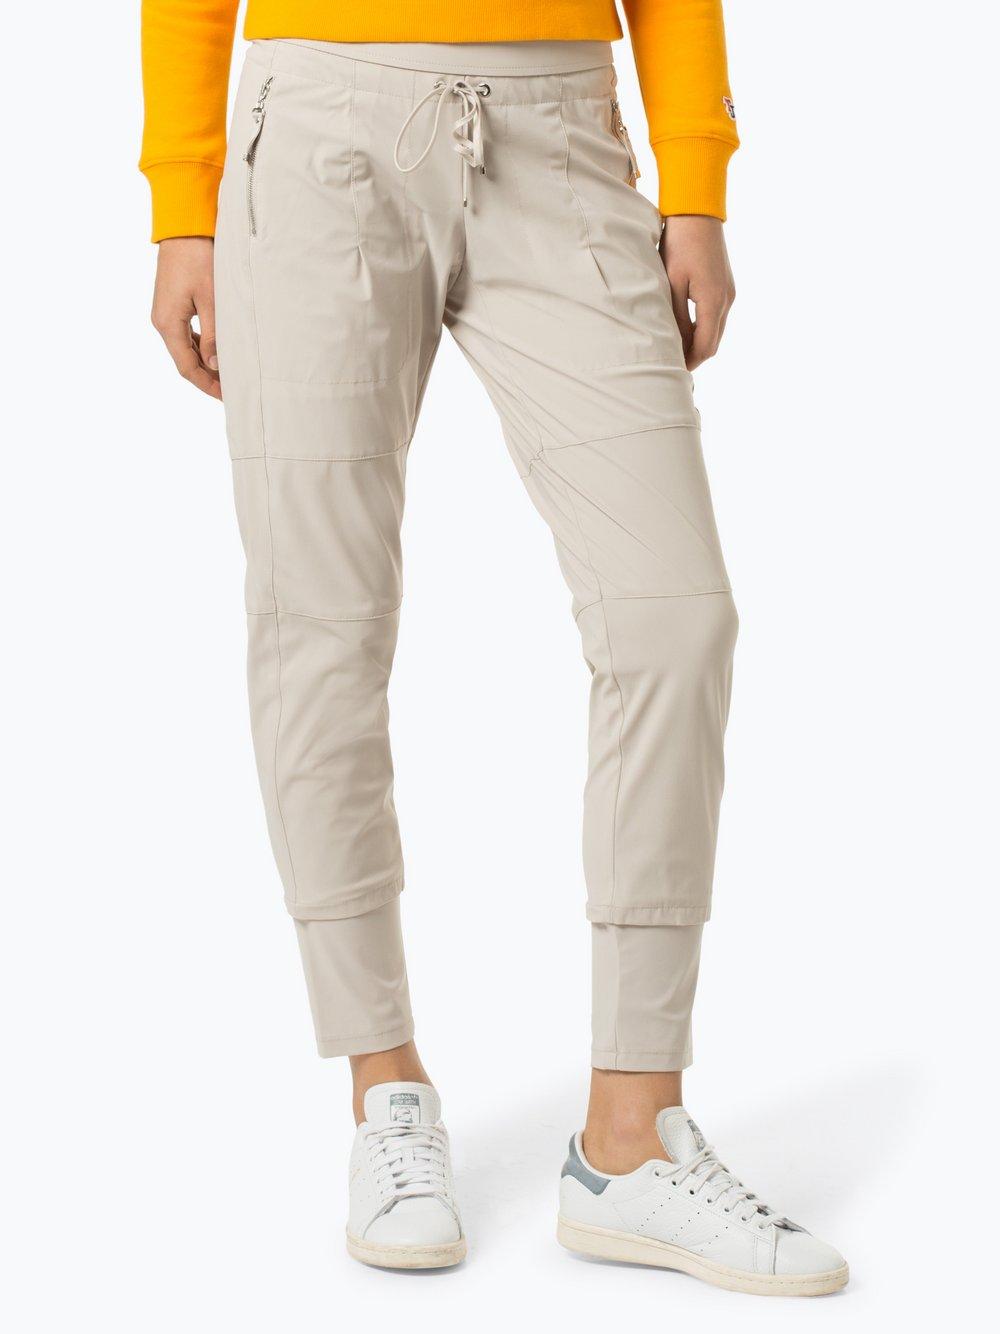 RAFFAELLO ROSSI - Spodnie damskie – Candy, beżowy